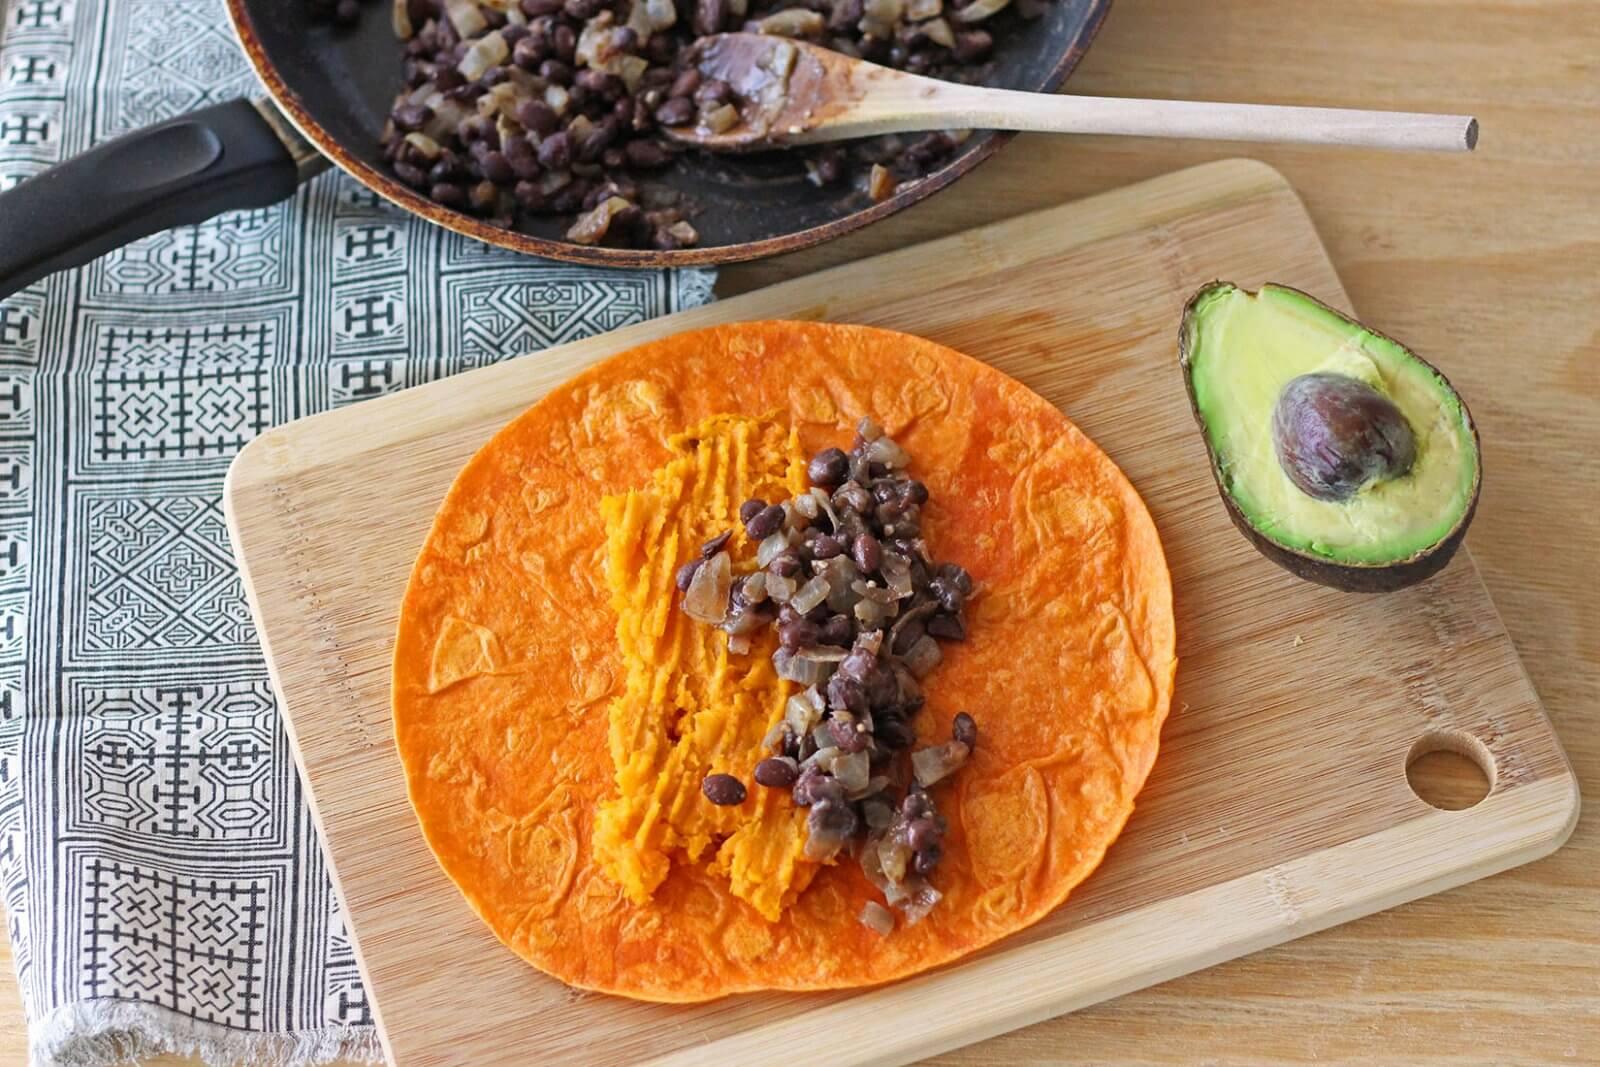 black bean enchiladas vegan sweet potato chipotle cashew cheese vegetarian red pepper burrito zenanzaatar zena 'n zaatar enchilada mexican food blog easy recipe